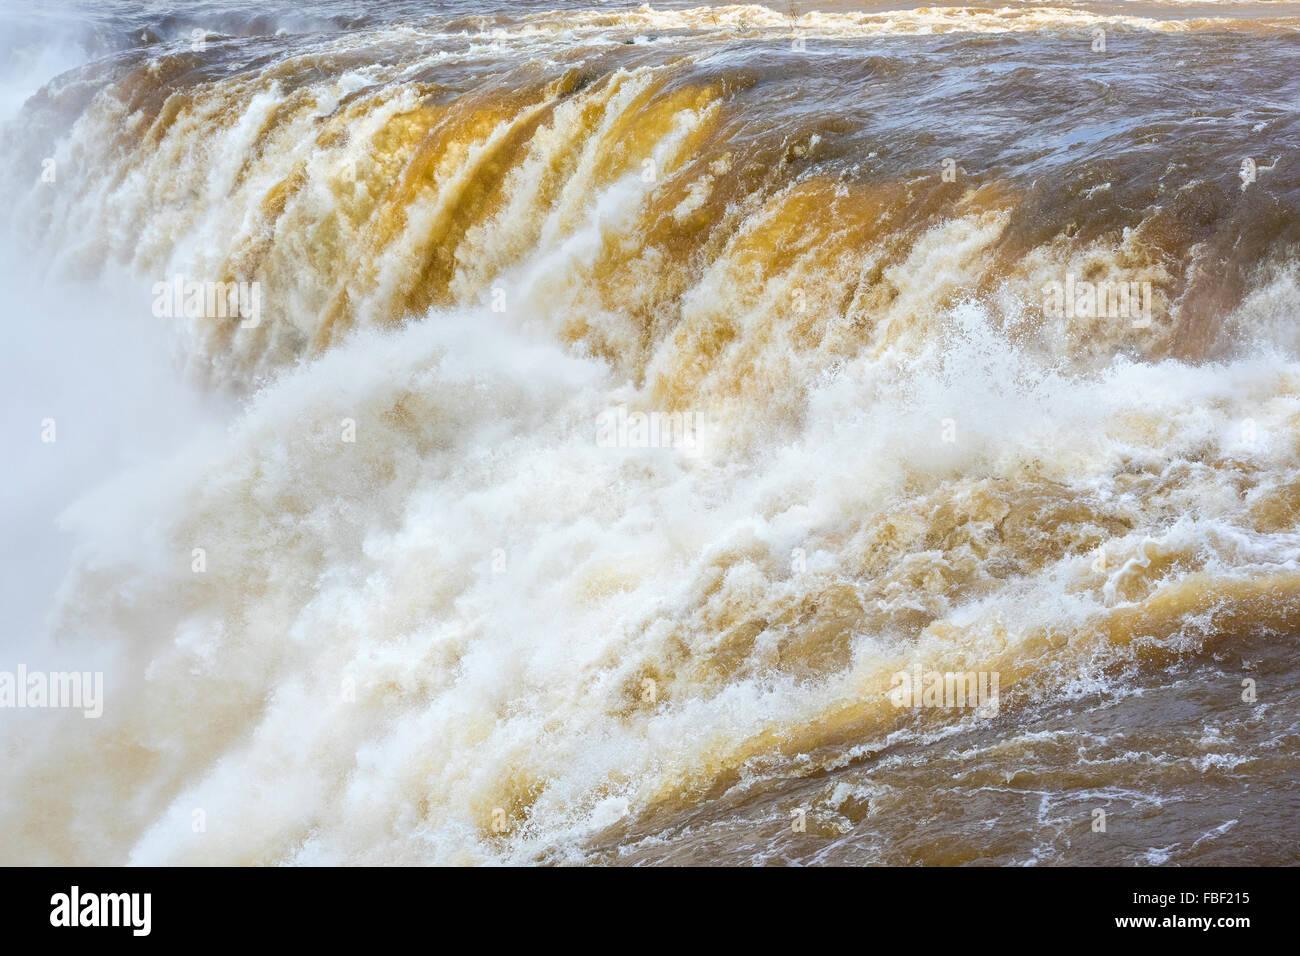 Close up of Devil's Throat (Garganta del Diablo), the largest cascade at Iguazu Falls, on the border of Argentina - Stock Image